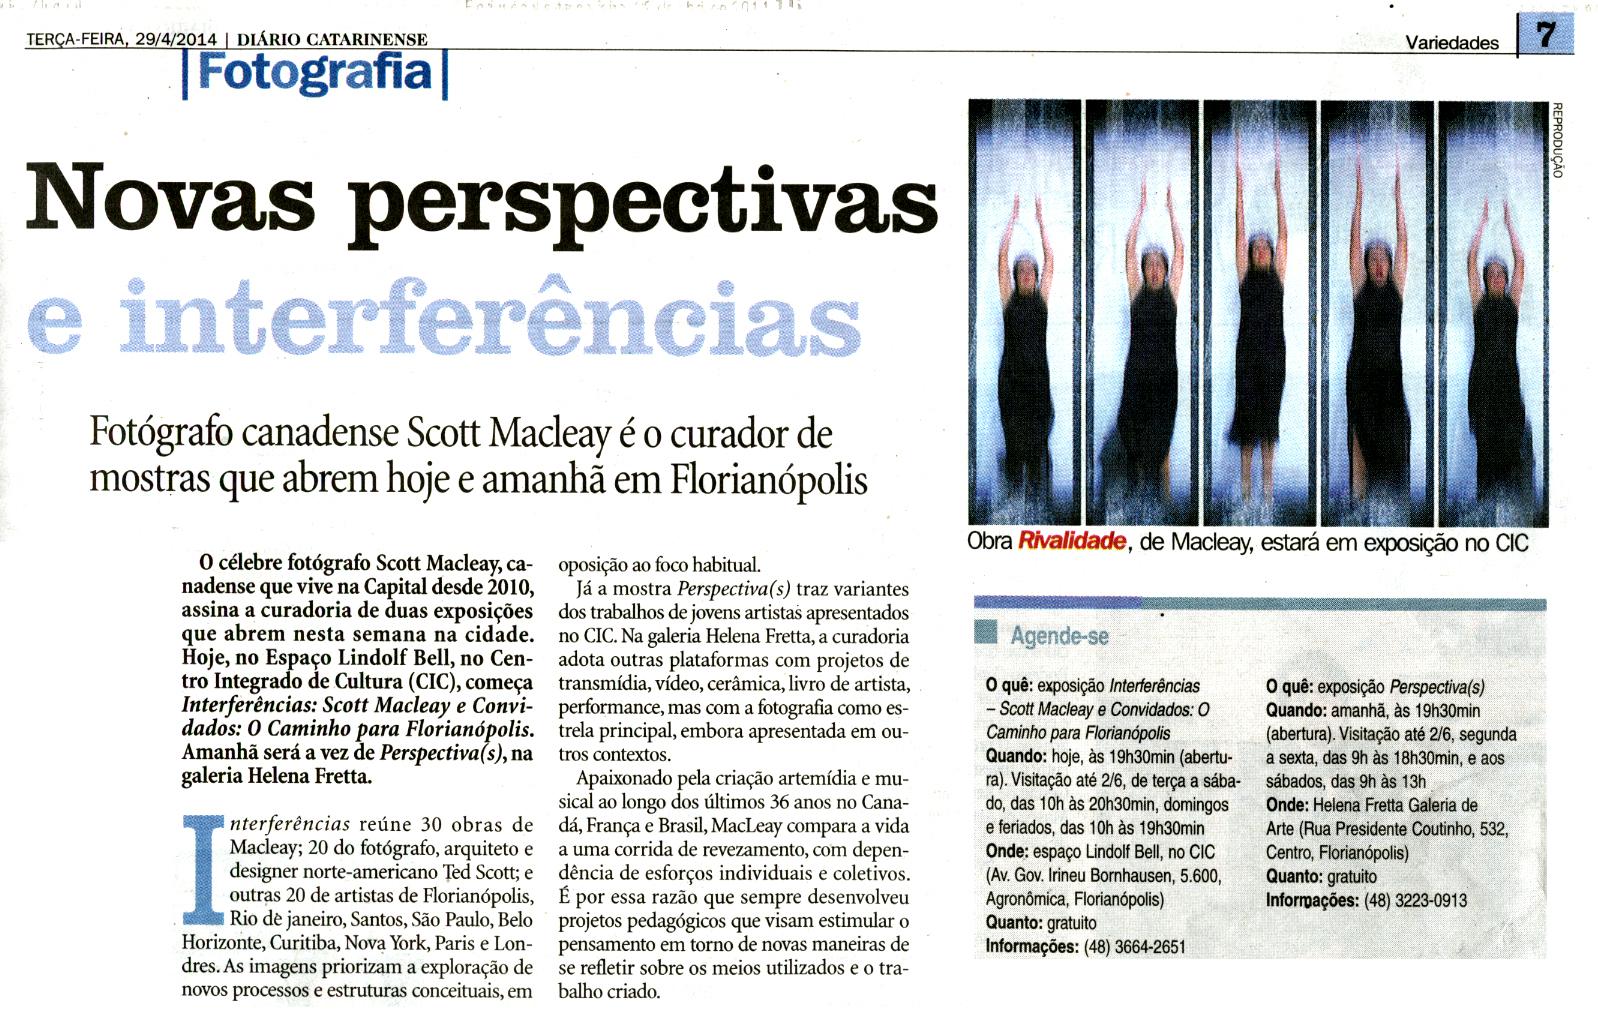 Diário Catarinense 29/04/14